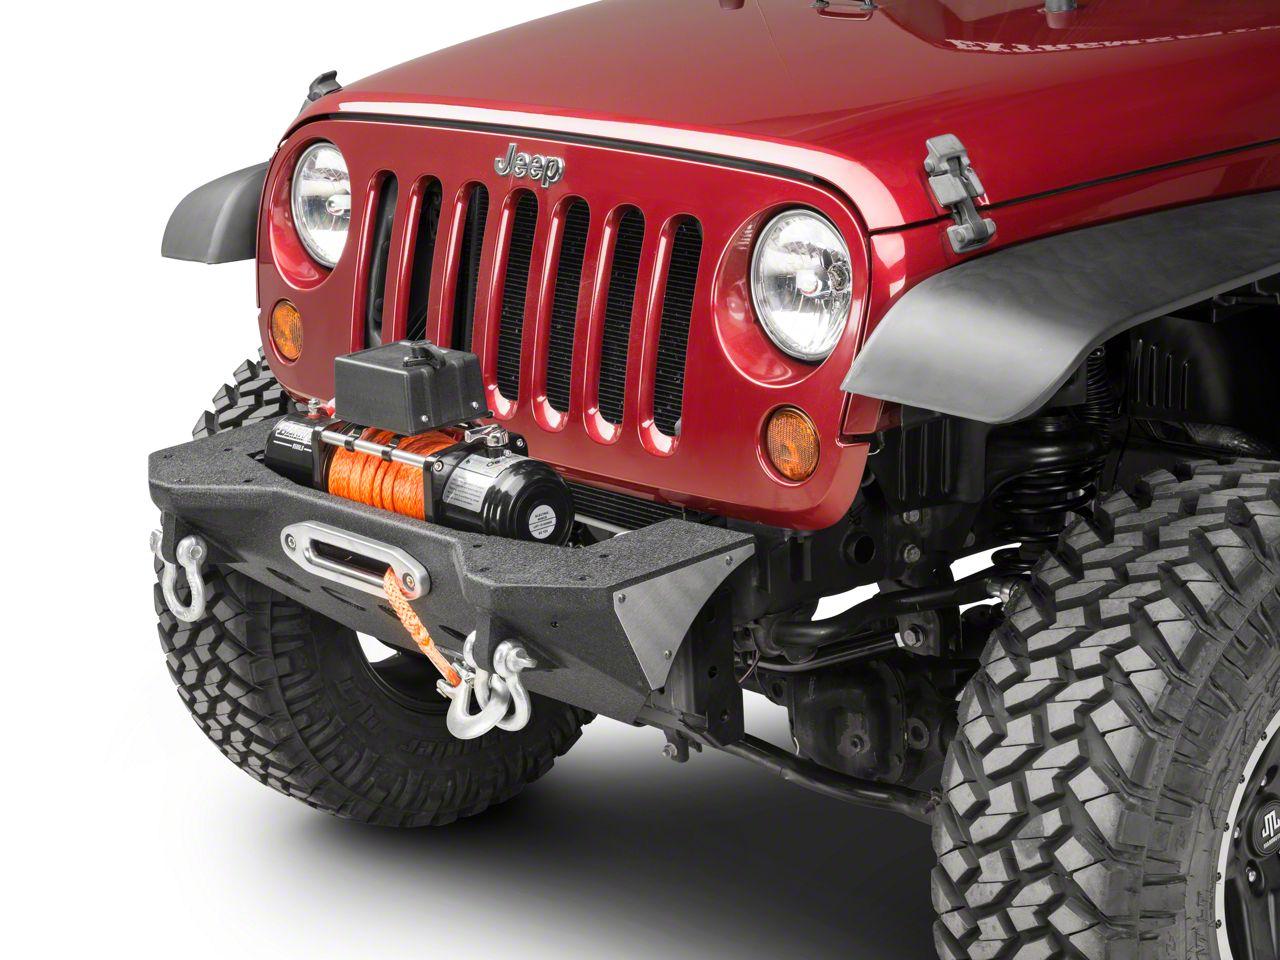 Smittybilt XRC M.O.D. Center Section Stubby Front Bumper w/ Winch Plate - Black Textured (07-18 Jeep Wrangler JK)